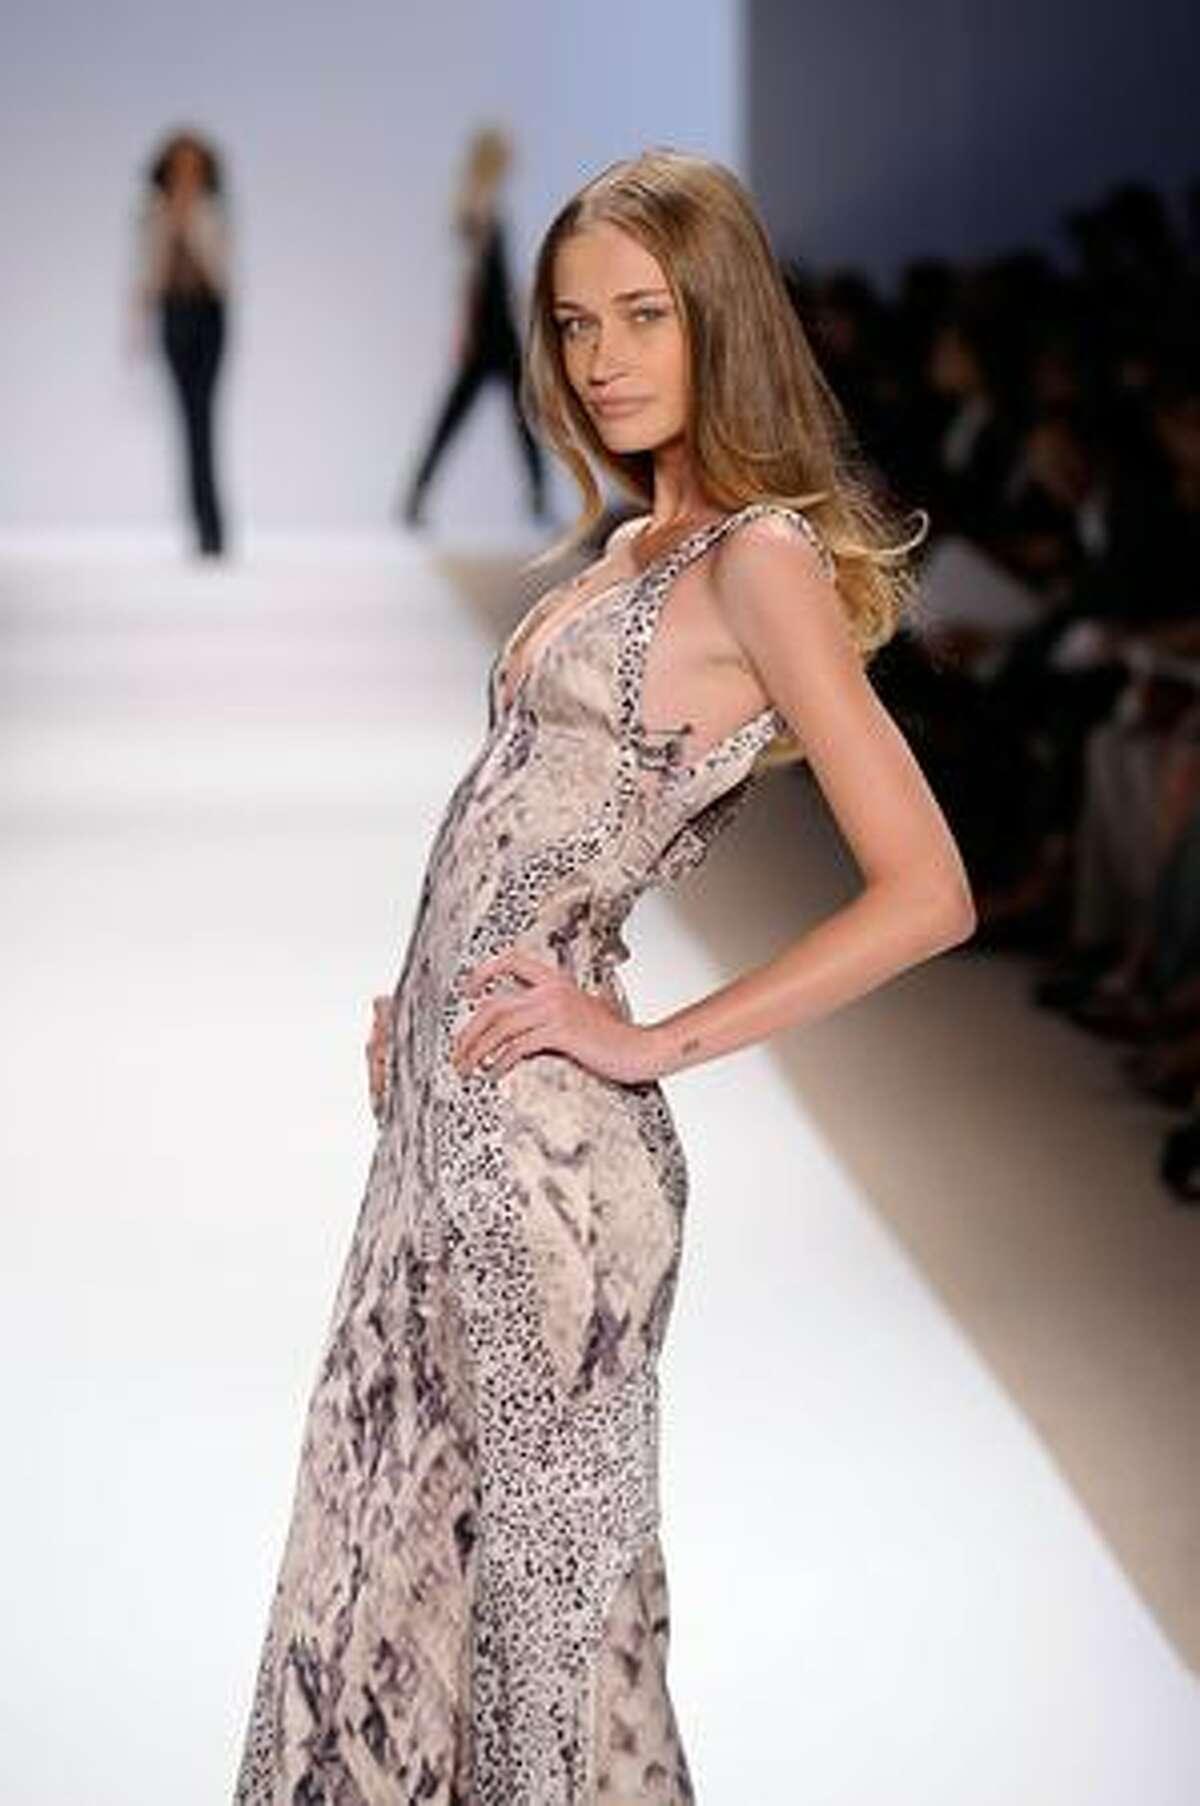 A model walks the runway at Carlos Miele Spring 2010 fashion show at the Promenade at Bryant Park in New York, New York.